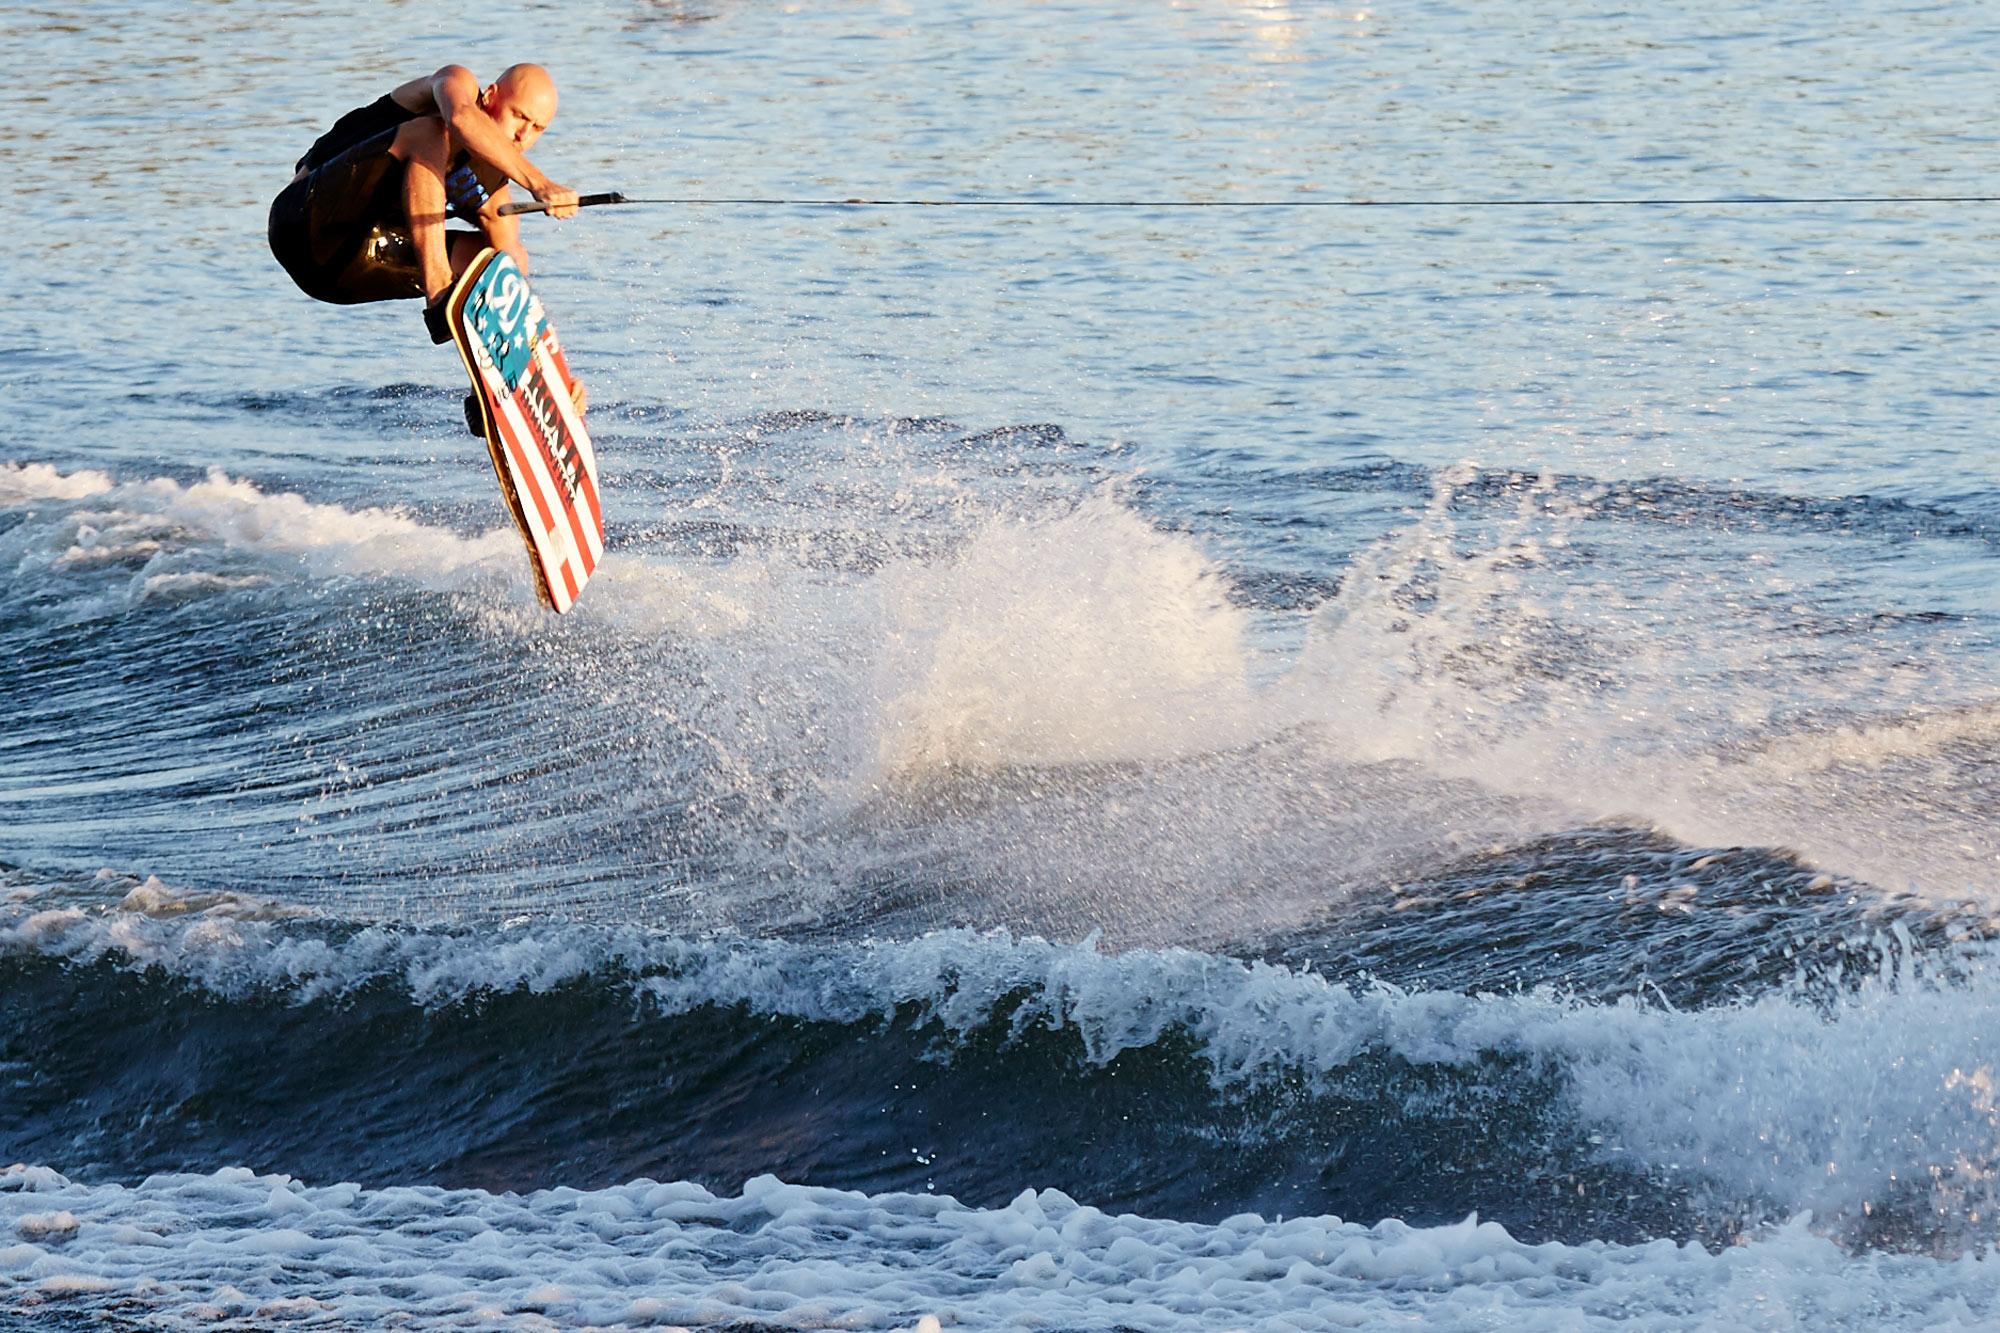 Aqua-bat_wakeboarders-minocqua-071715_206.jpg